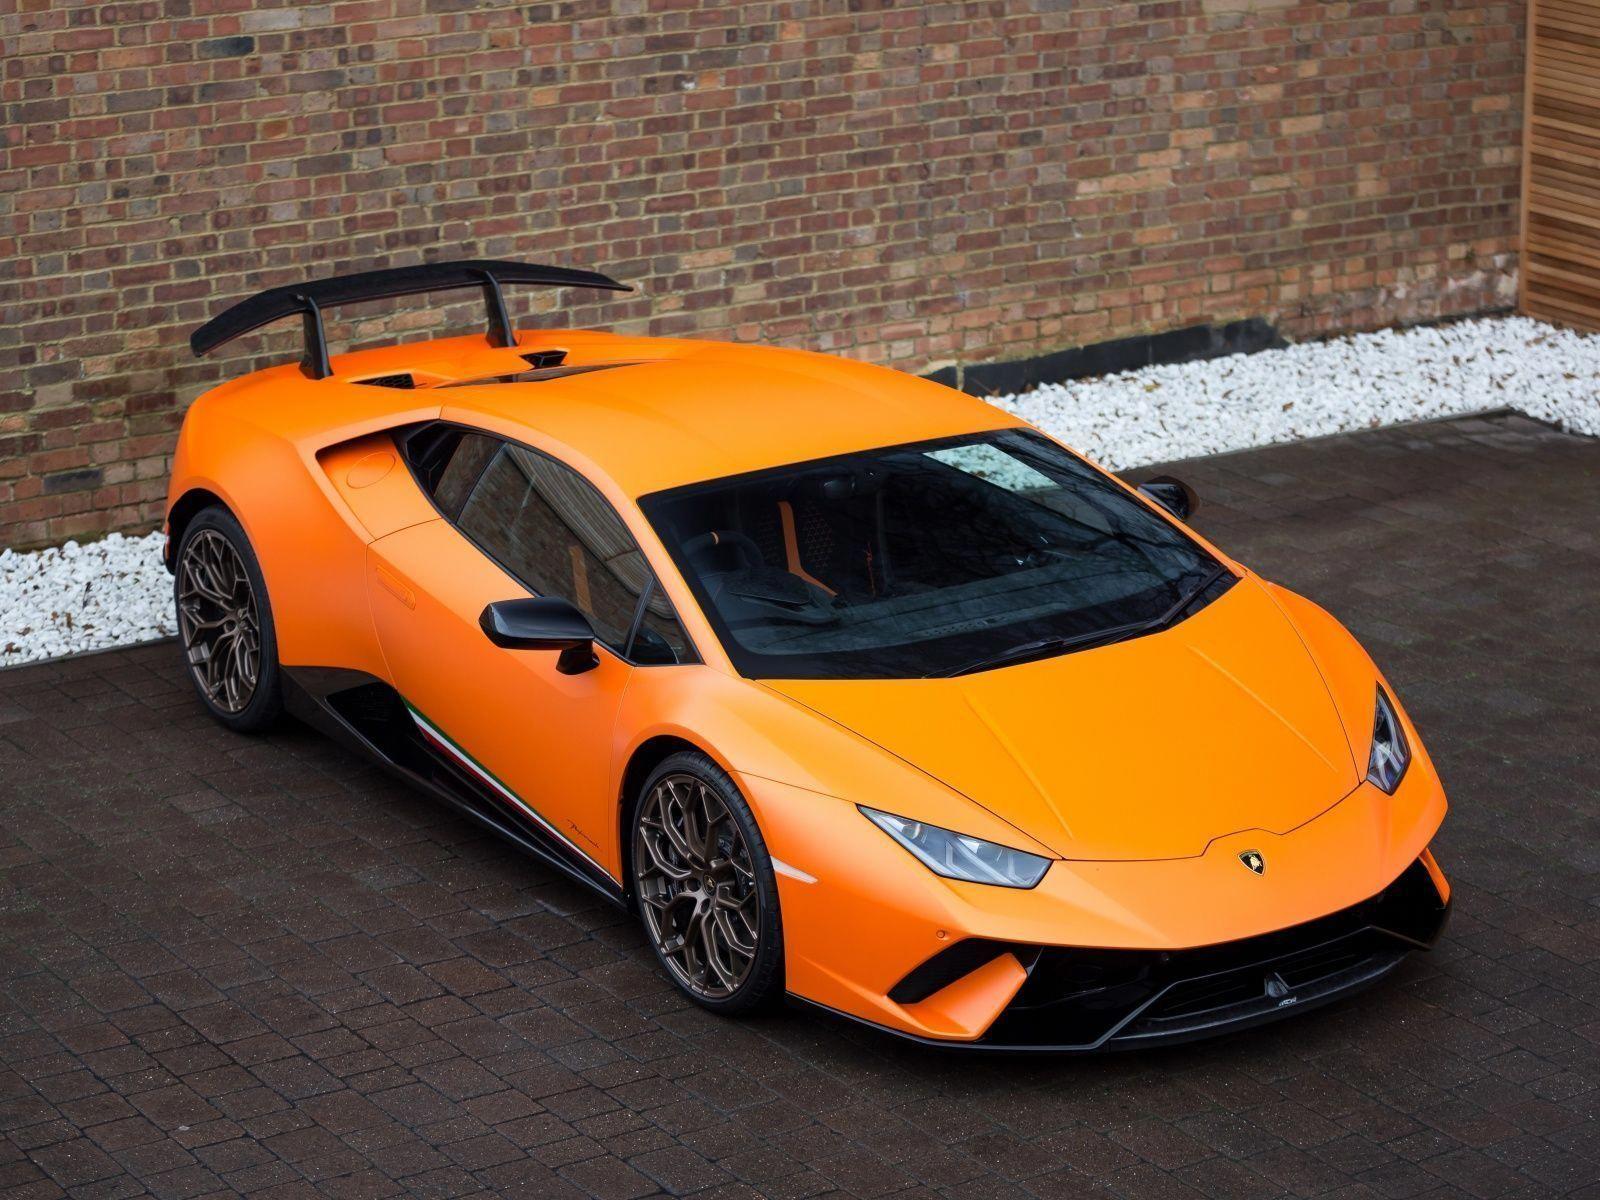 2017 Lamborghini Huracán - Performante #AlfaRomeo #lamborghinihuracan 2017 Lamborghini Huracán - Performante #AlfaRomeo #lamborghinihuracan 2017 Lamborghini Huracán - Performante #AlfaRomeo #lamborghinihuracan 2017 Lamborghini Huracán - Performante #AlfaRomeo #lamborghinihuracan 2017 Lamborghini Huracán - Performante #AlfaRomeo #lamborghinihuracan 2017 Lamborghini Huracán - Performante #AlfaRomeo #lamborghinihuracan 2017 Lamborghini Huracán - Performante #AlfaRomeo #lamborghinihura